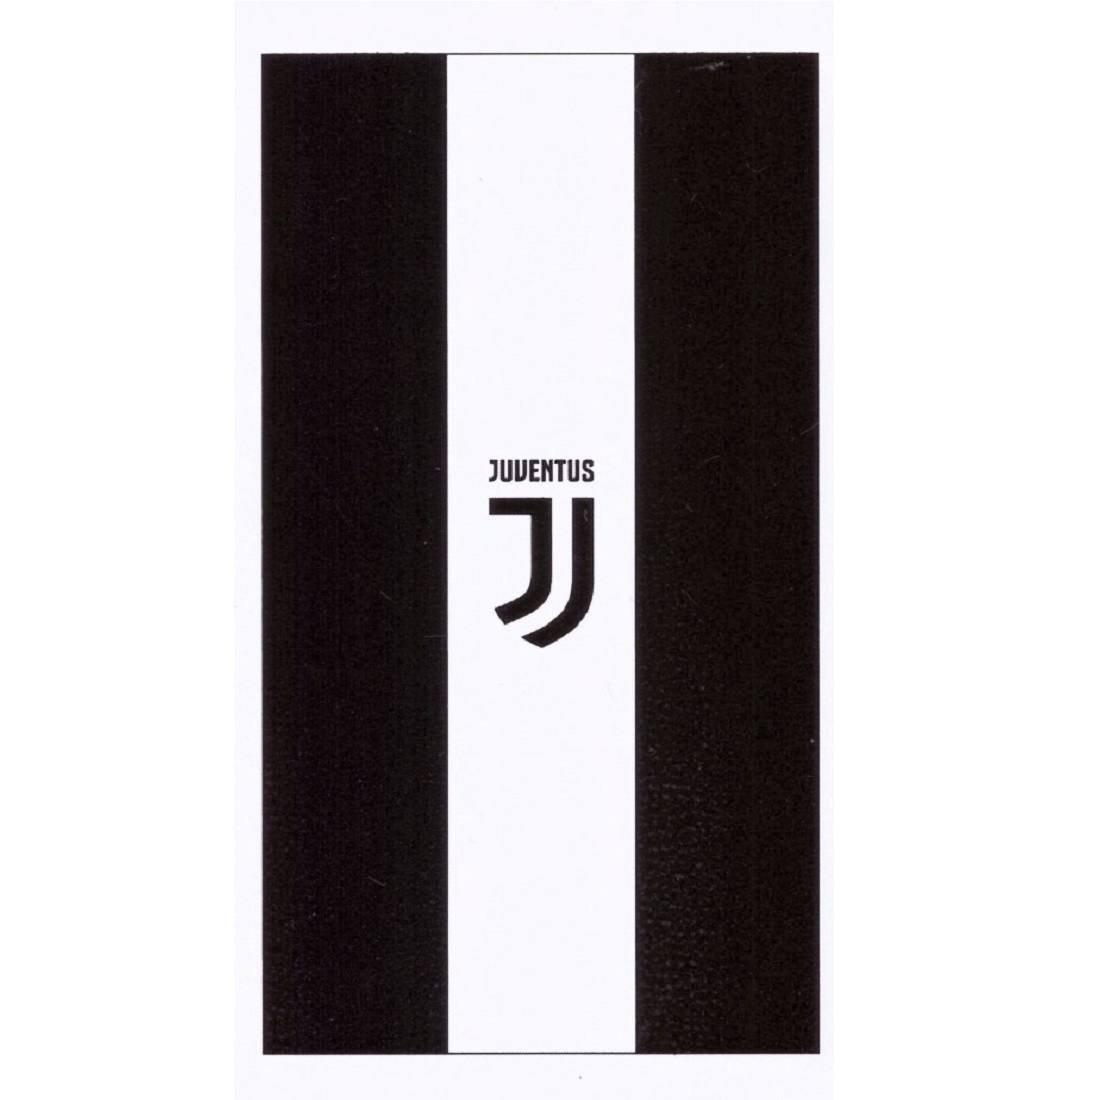 TELO MARE JUVENTUS NUOVO LOGO 70X140 prodotto ufficiale Juventus F.C